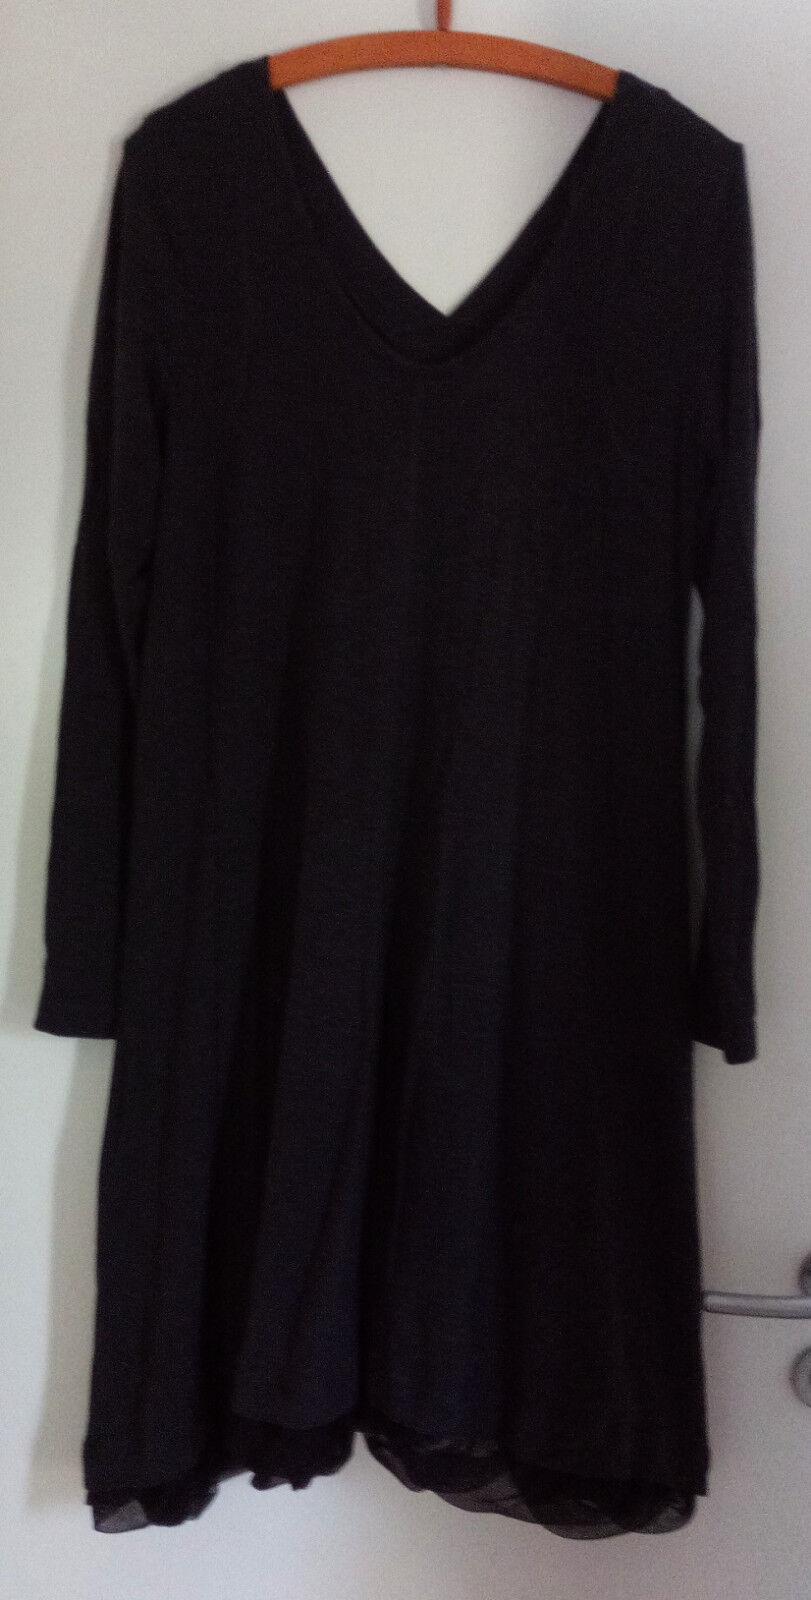 LAUREN VIDAL robe Größe XL (42 44 46) Blau-Drave NP   BW 46 cm